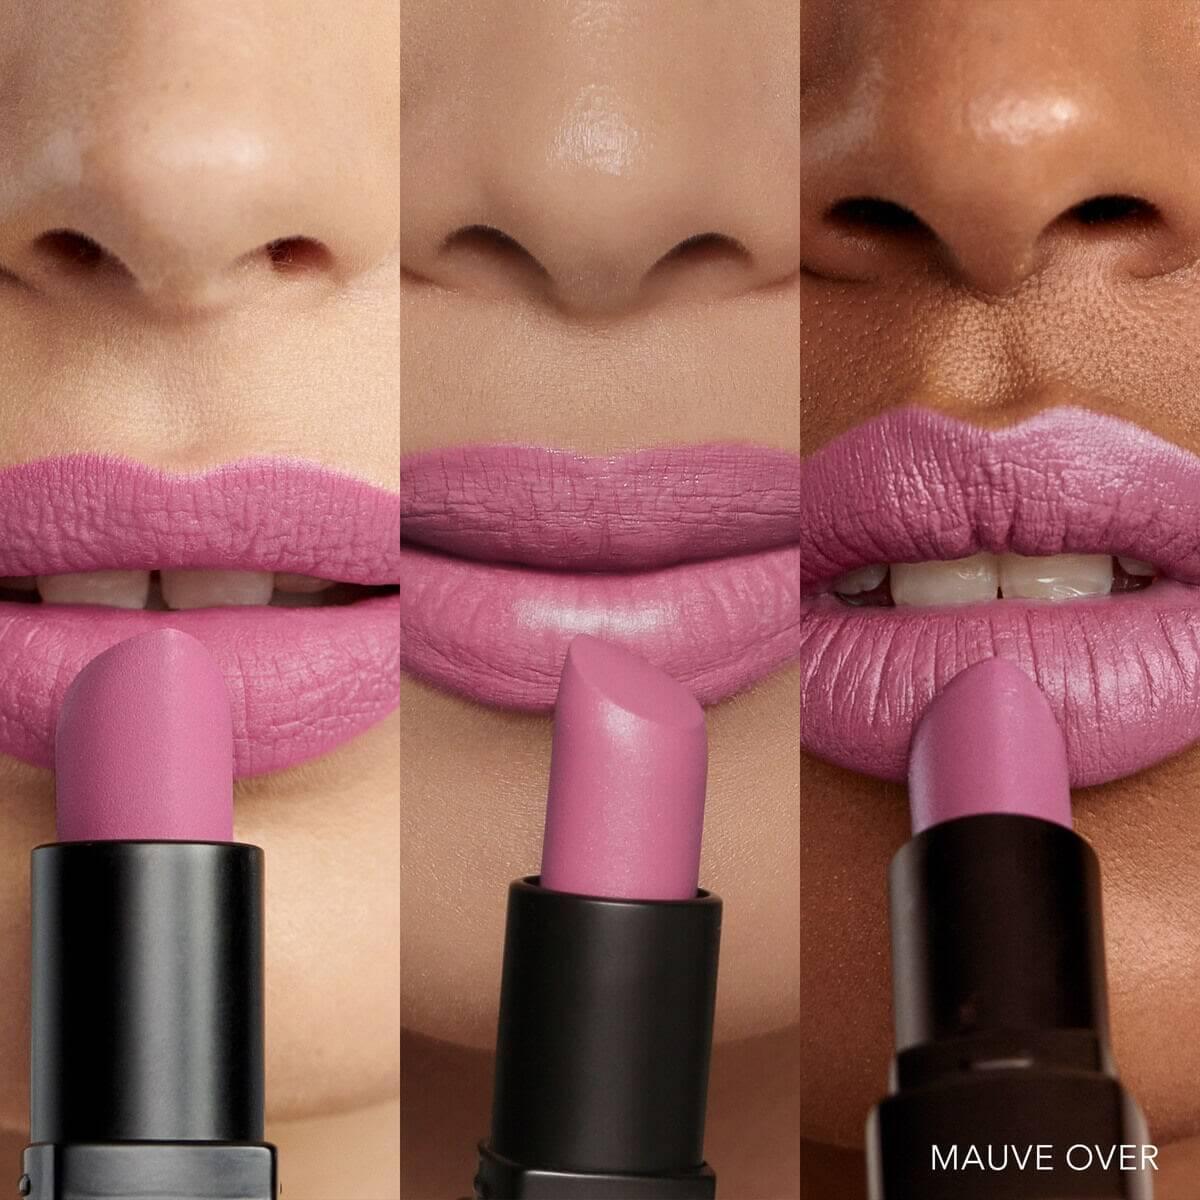 Mauve Lip Color shade